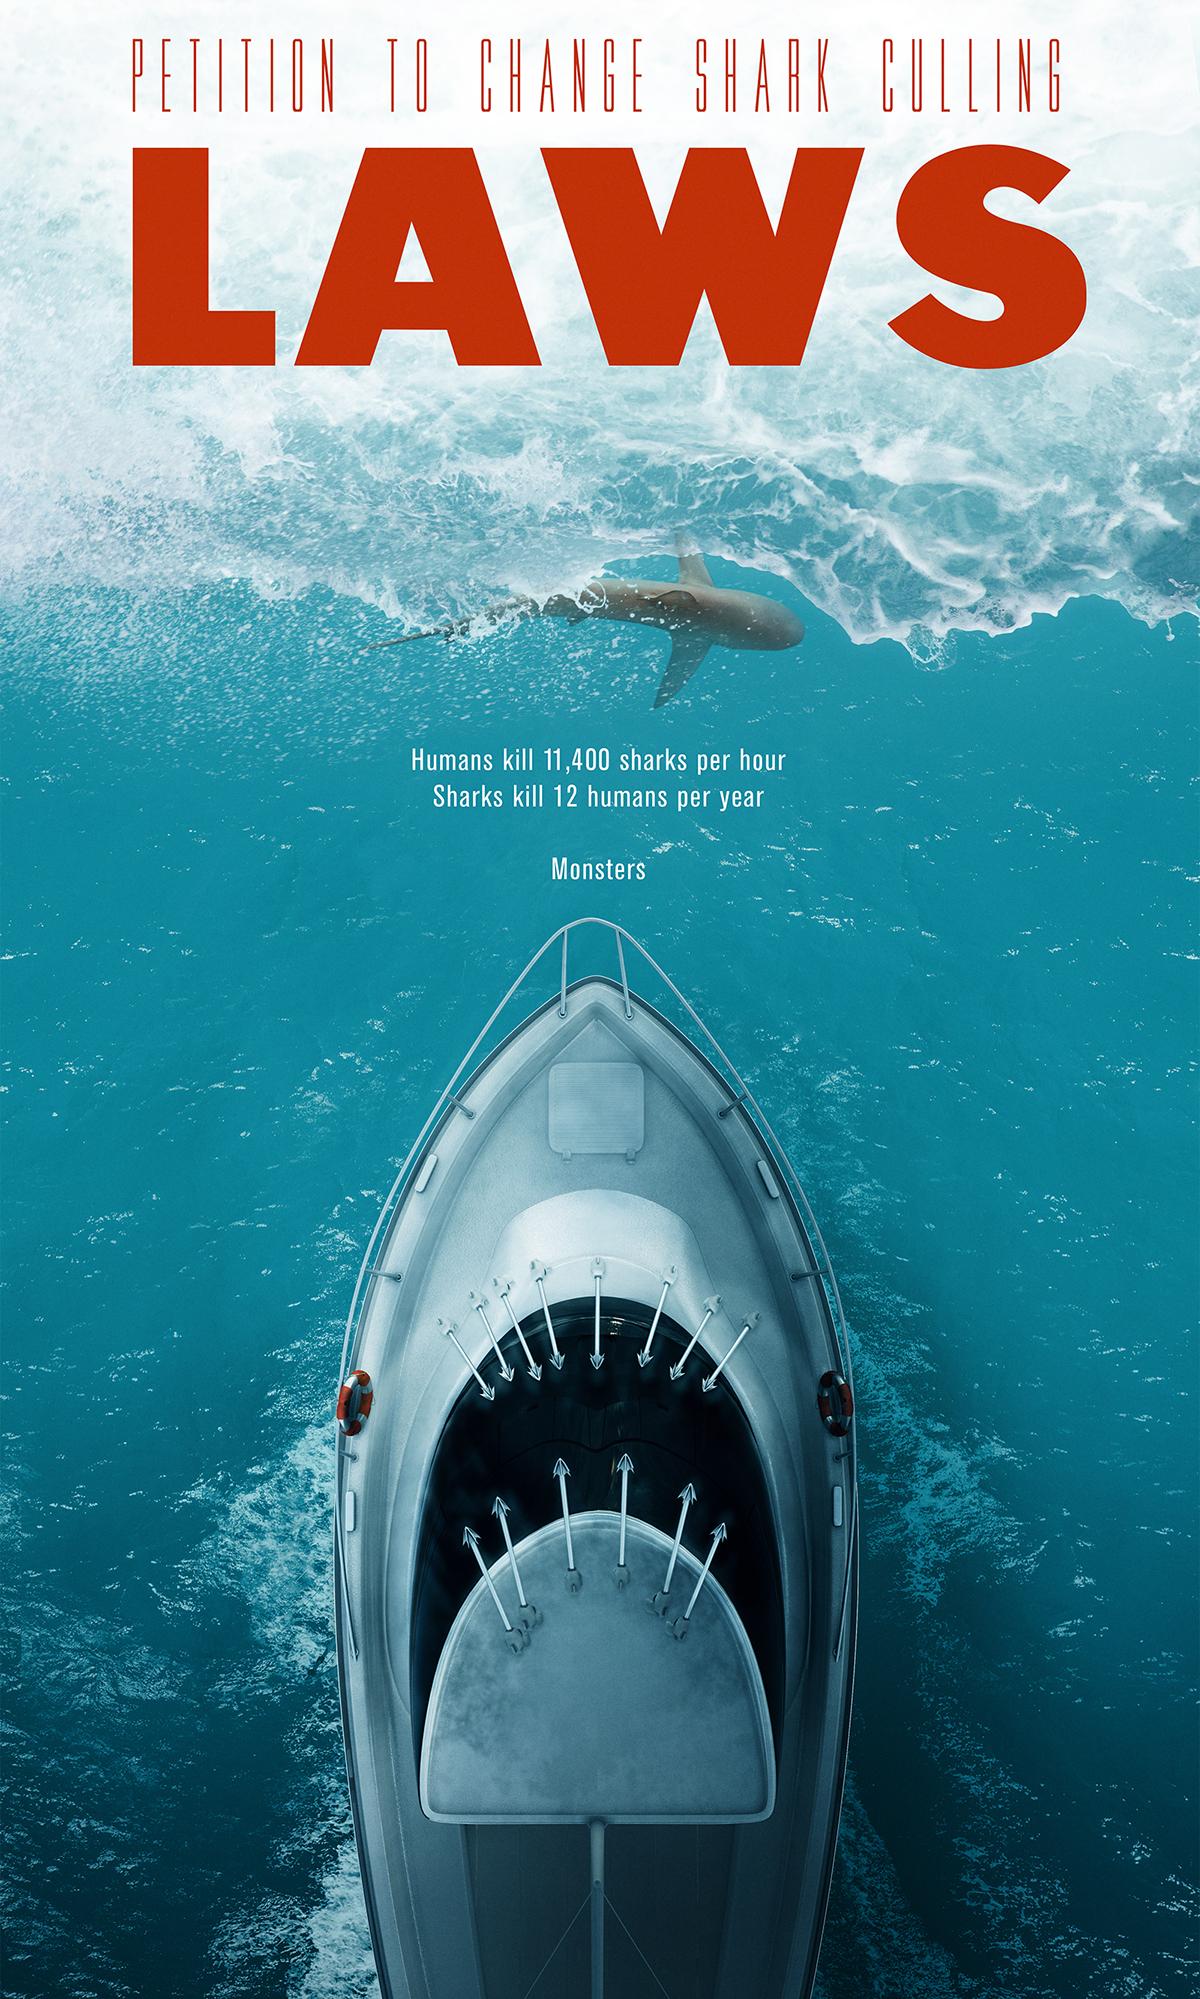 jaws,shark,Culling,cull,Hunting,animal